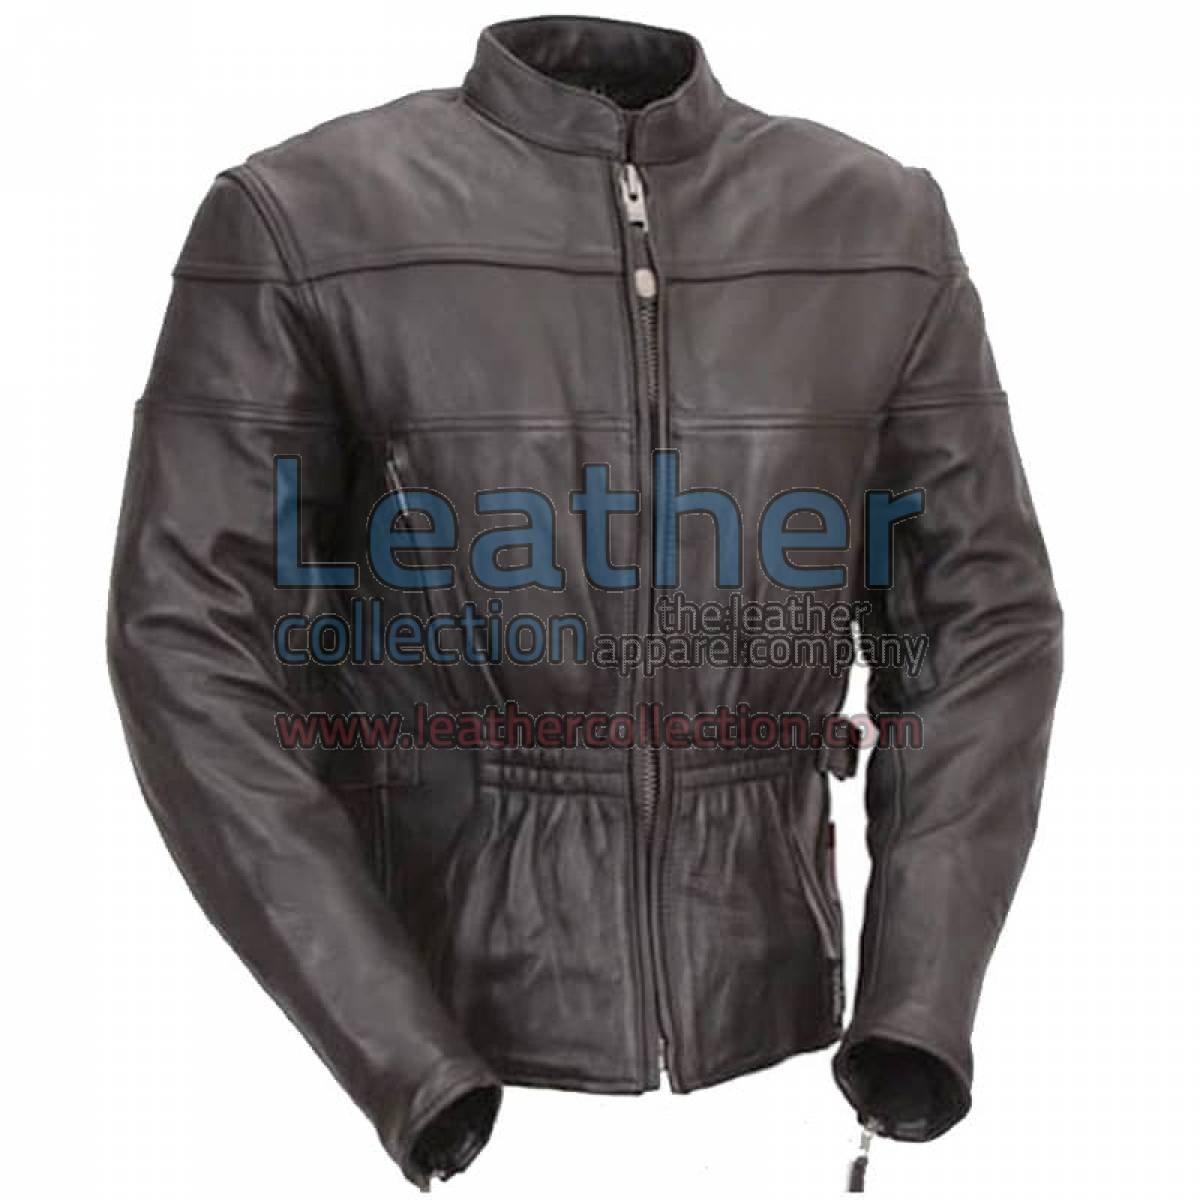 Premium Black Leather Motorcycle Touring Jacket